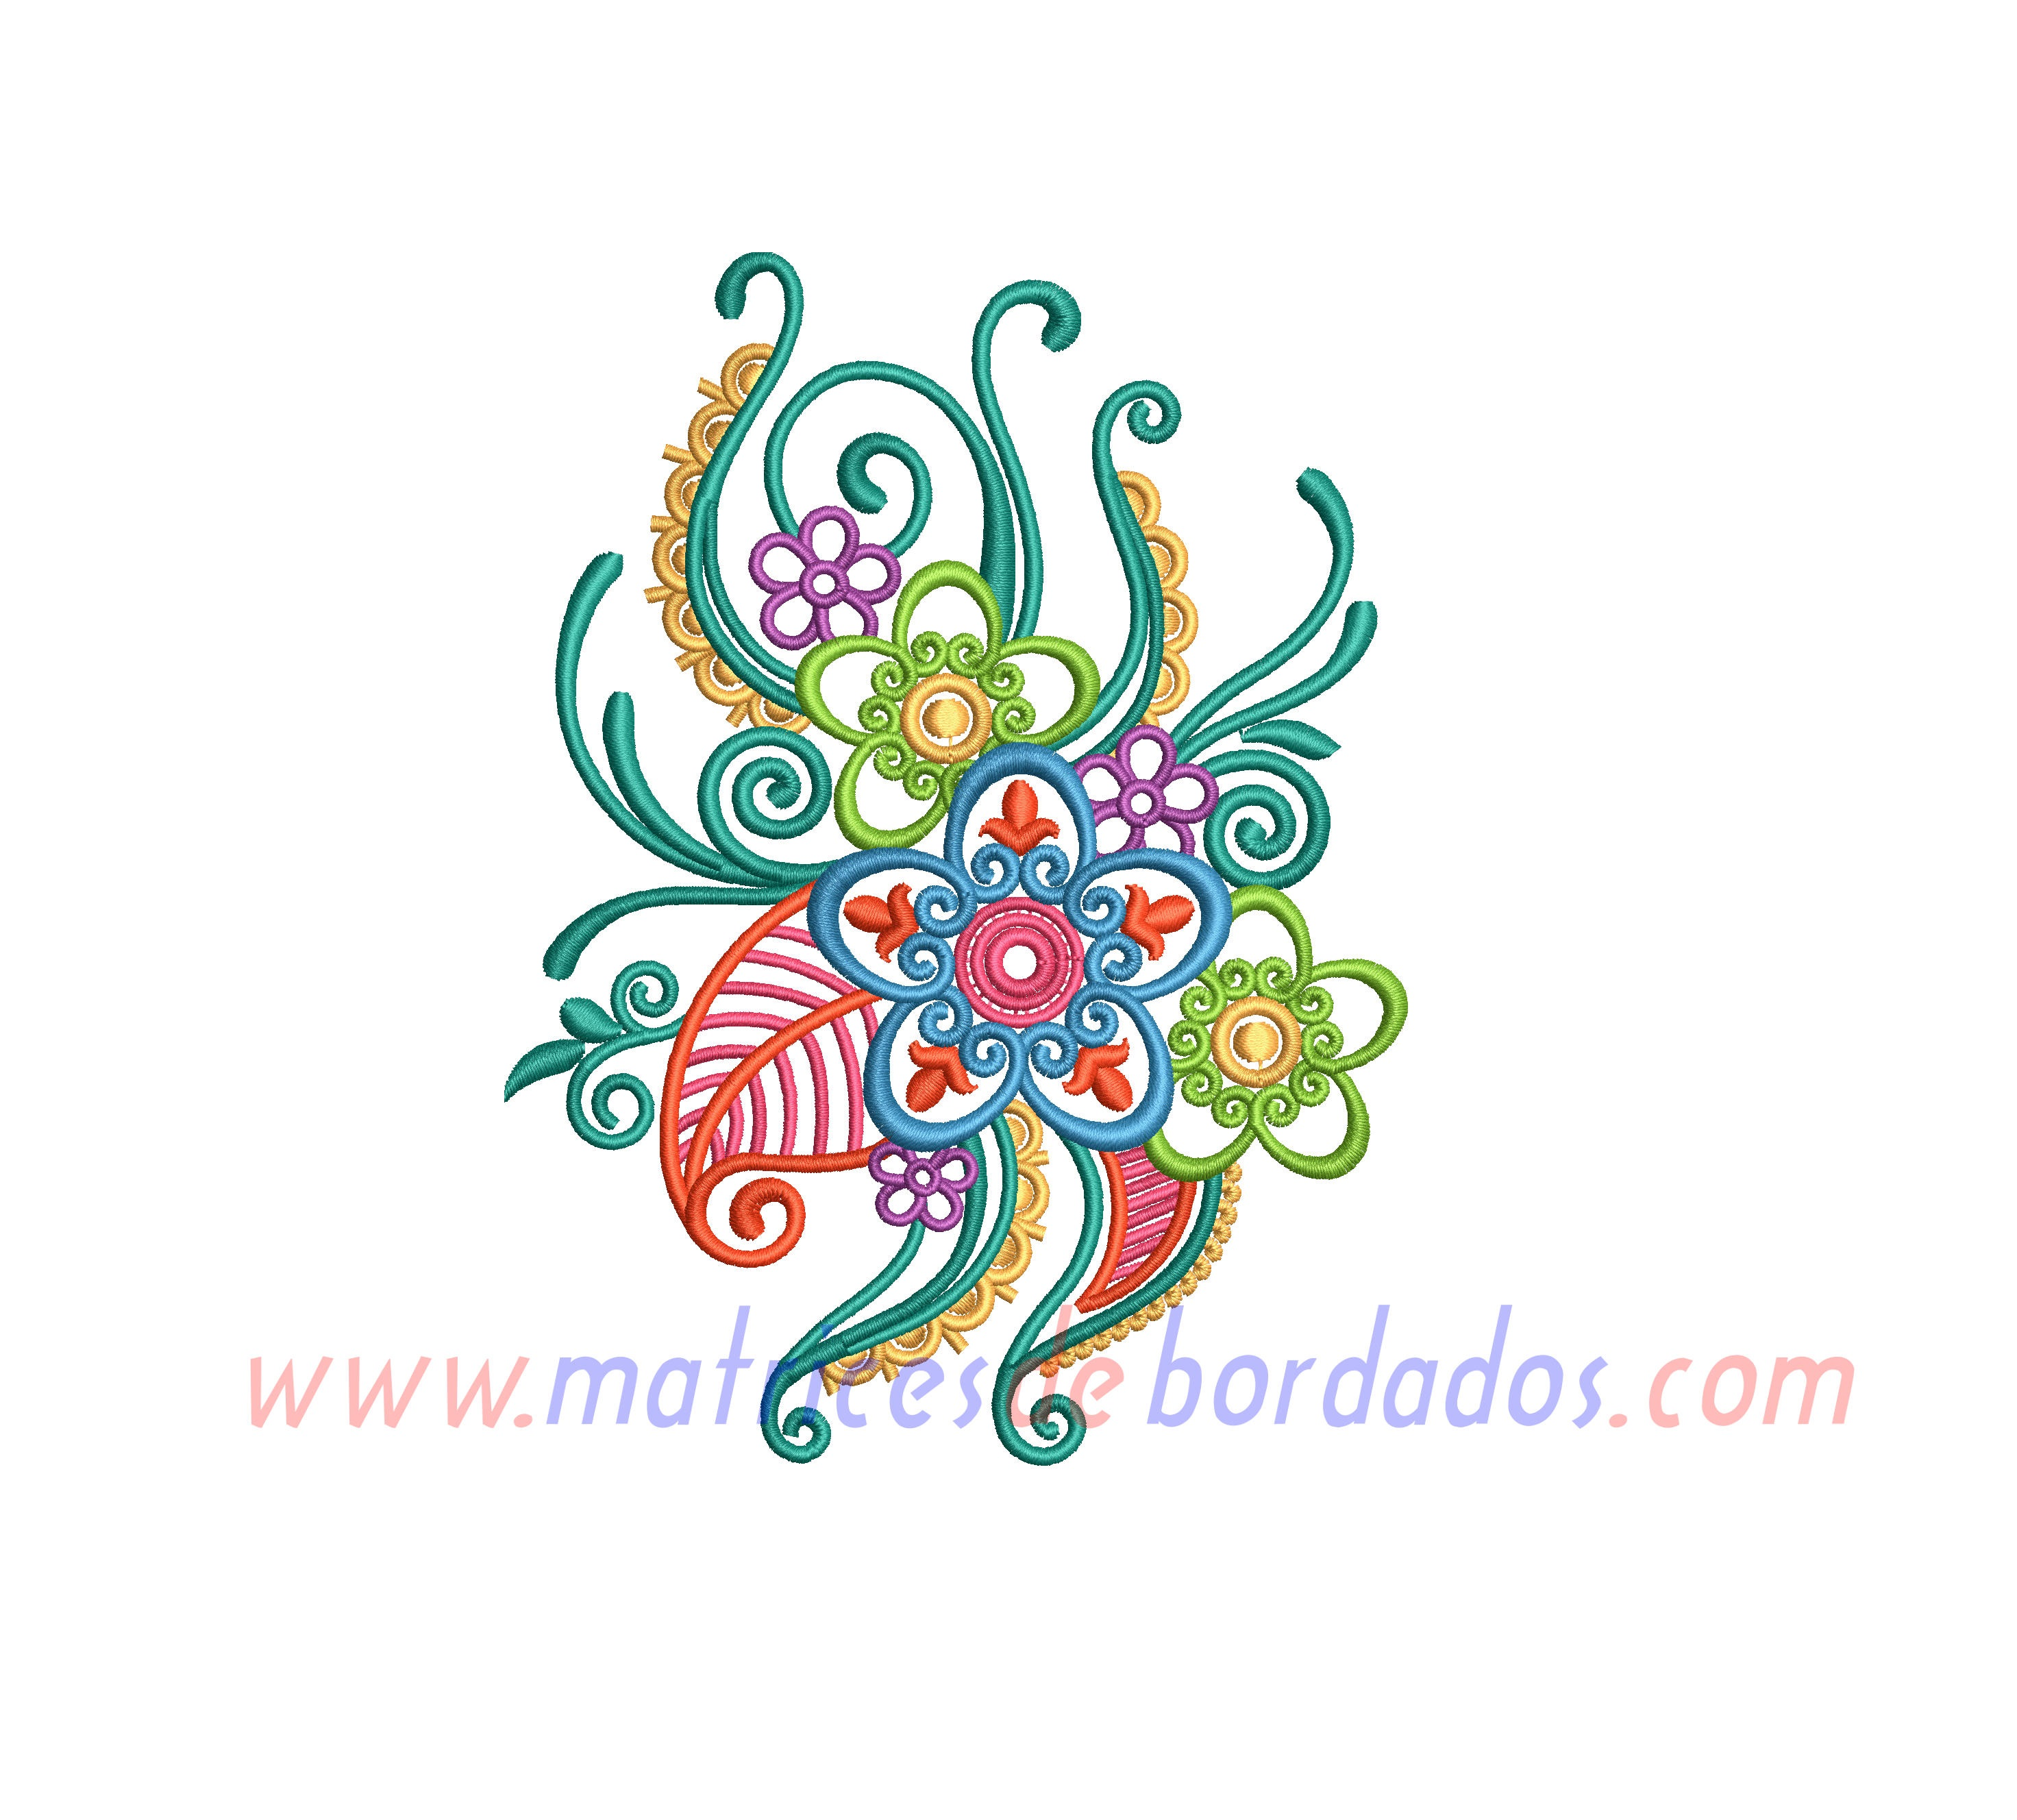 NX94NH - Diseño Floral